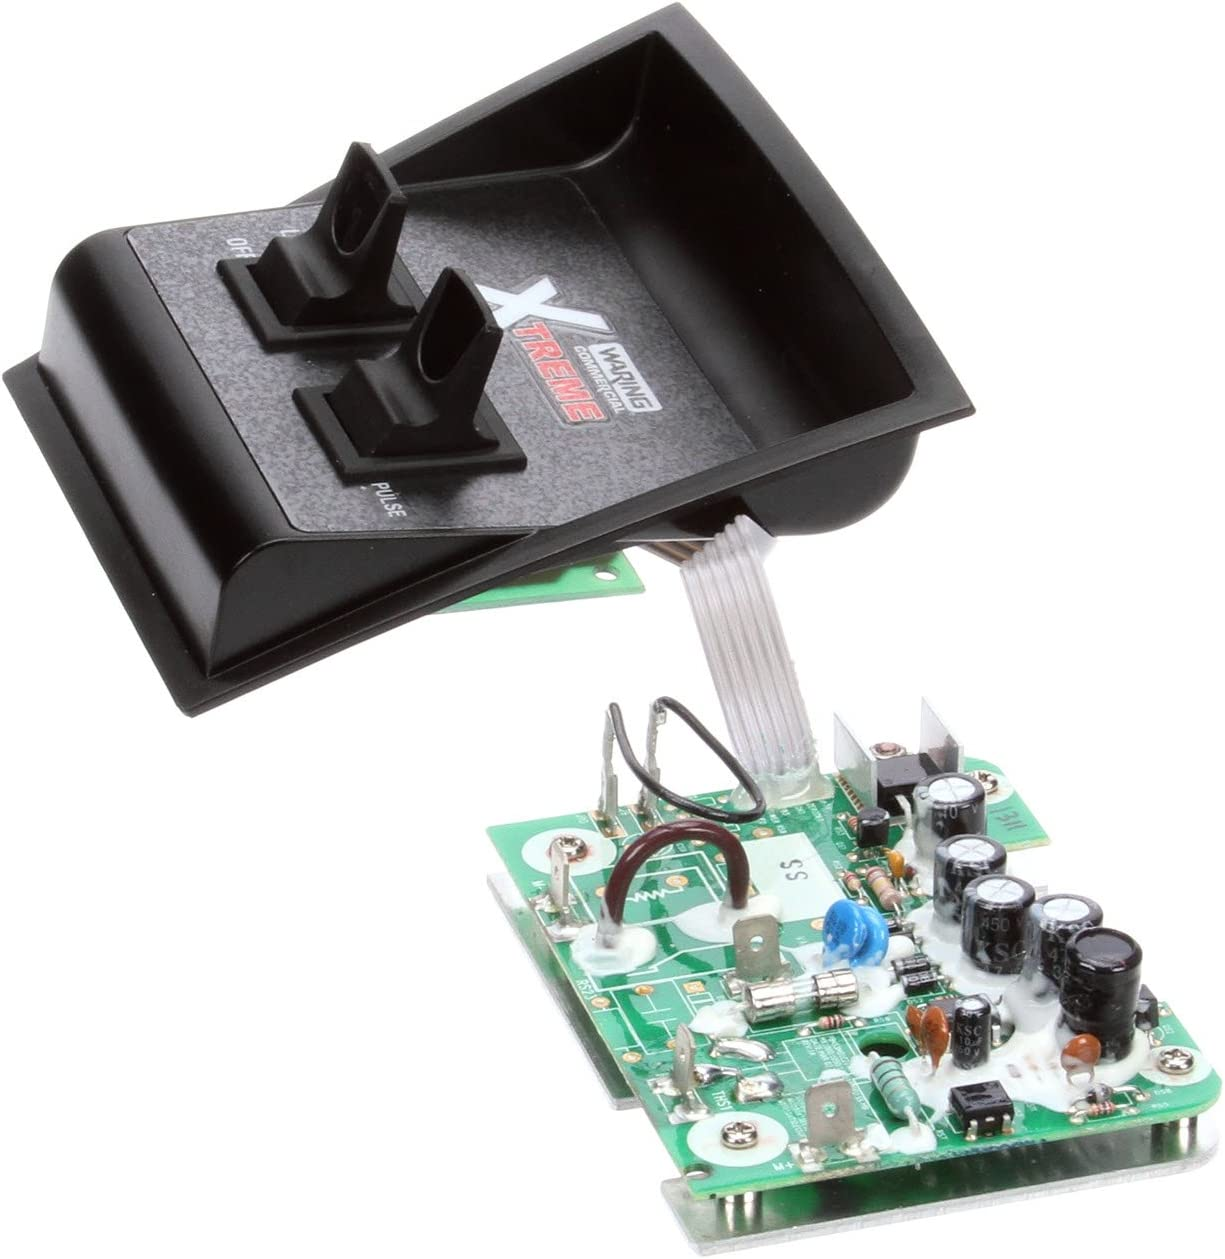 Waring 033465 Soft Start Control Panel